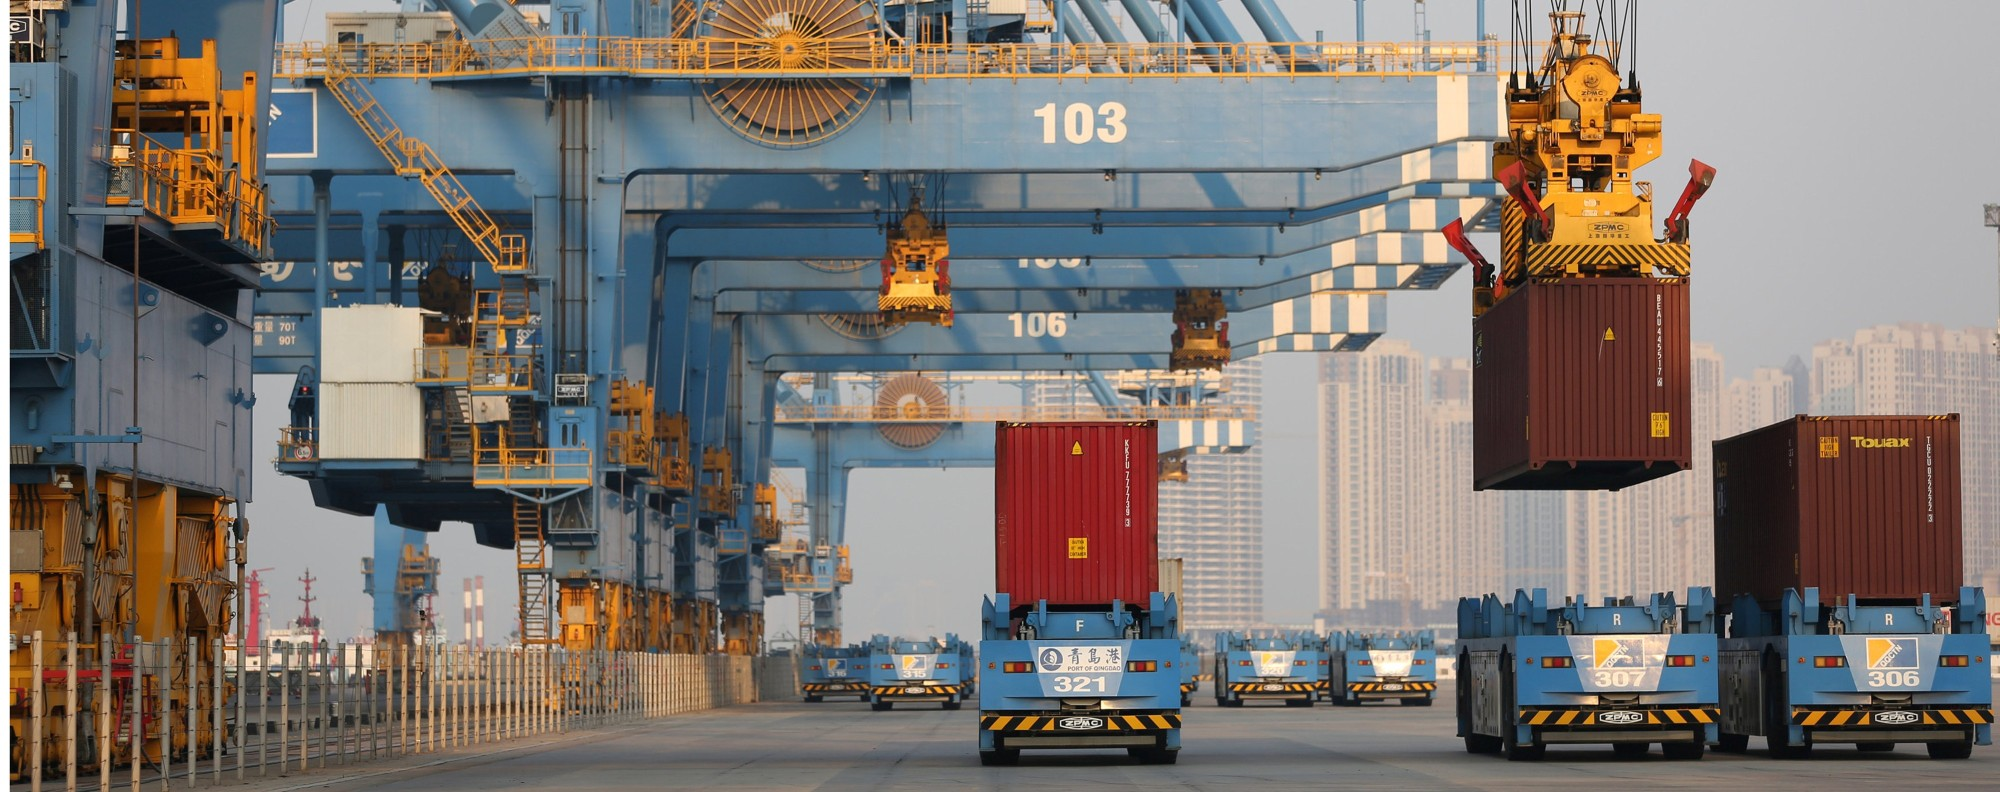 Qingdao port, Shandong province. Picture: Handout